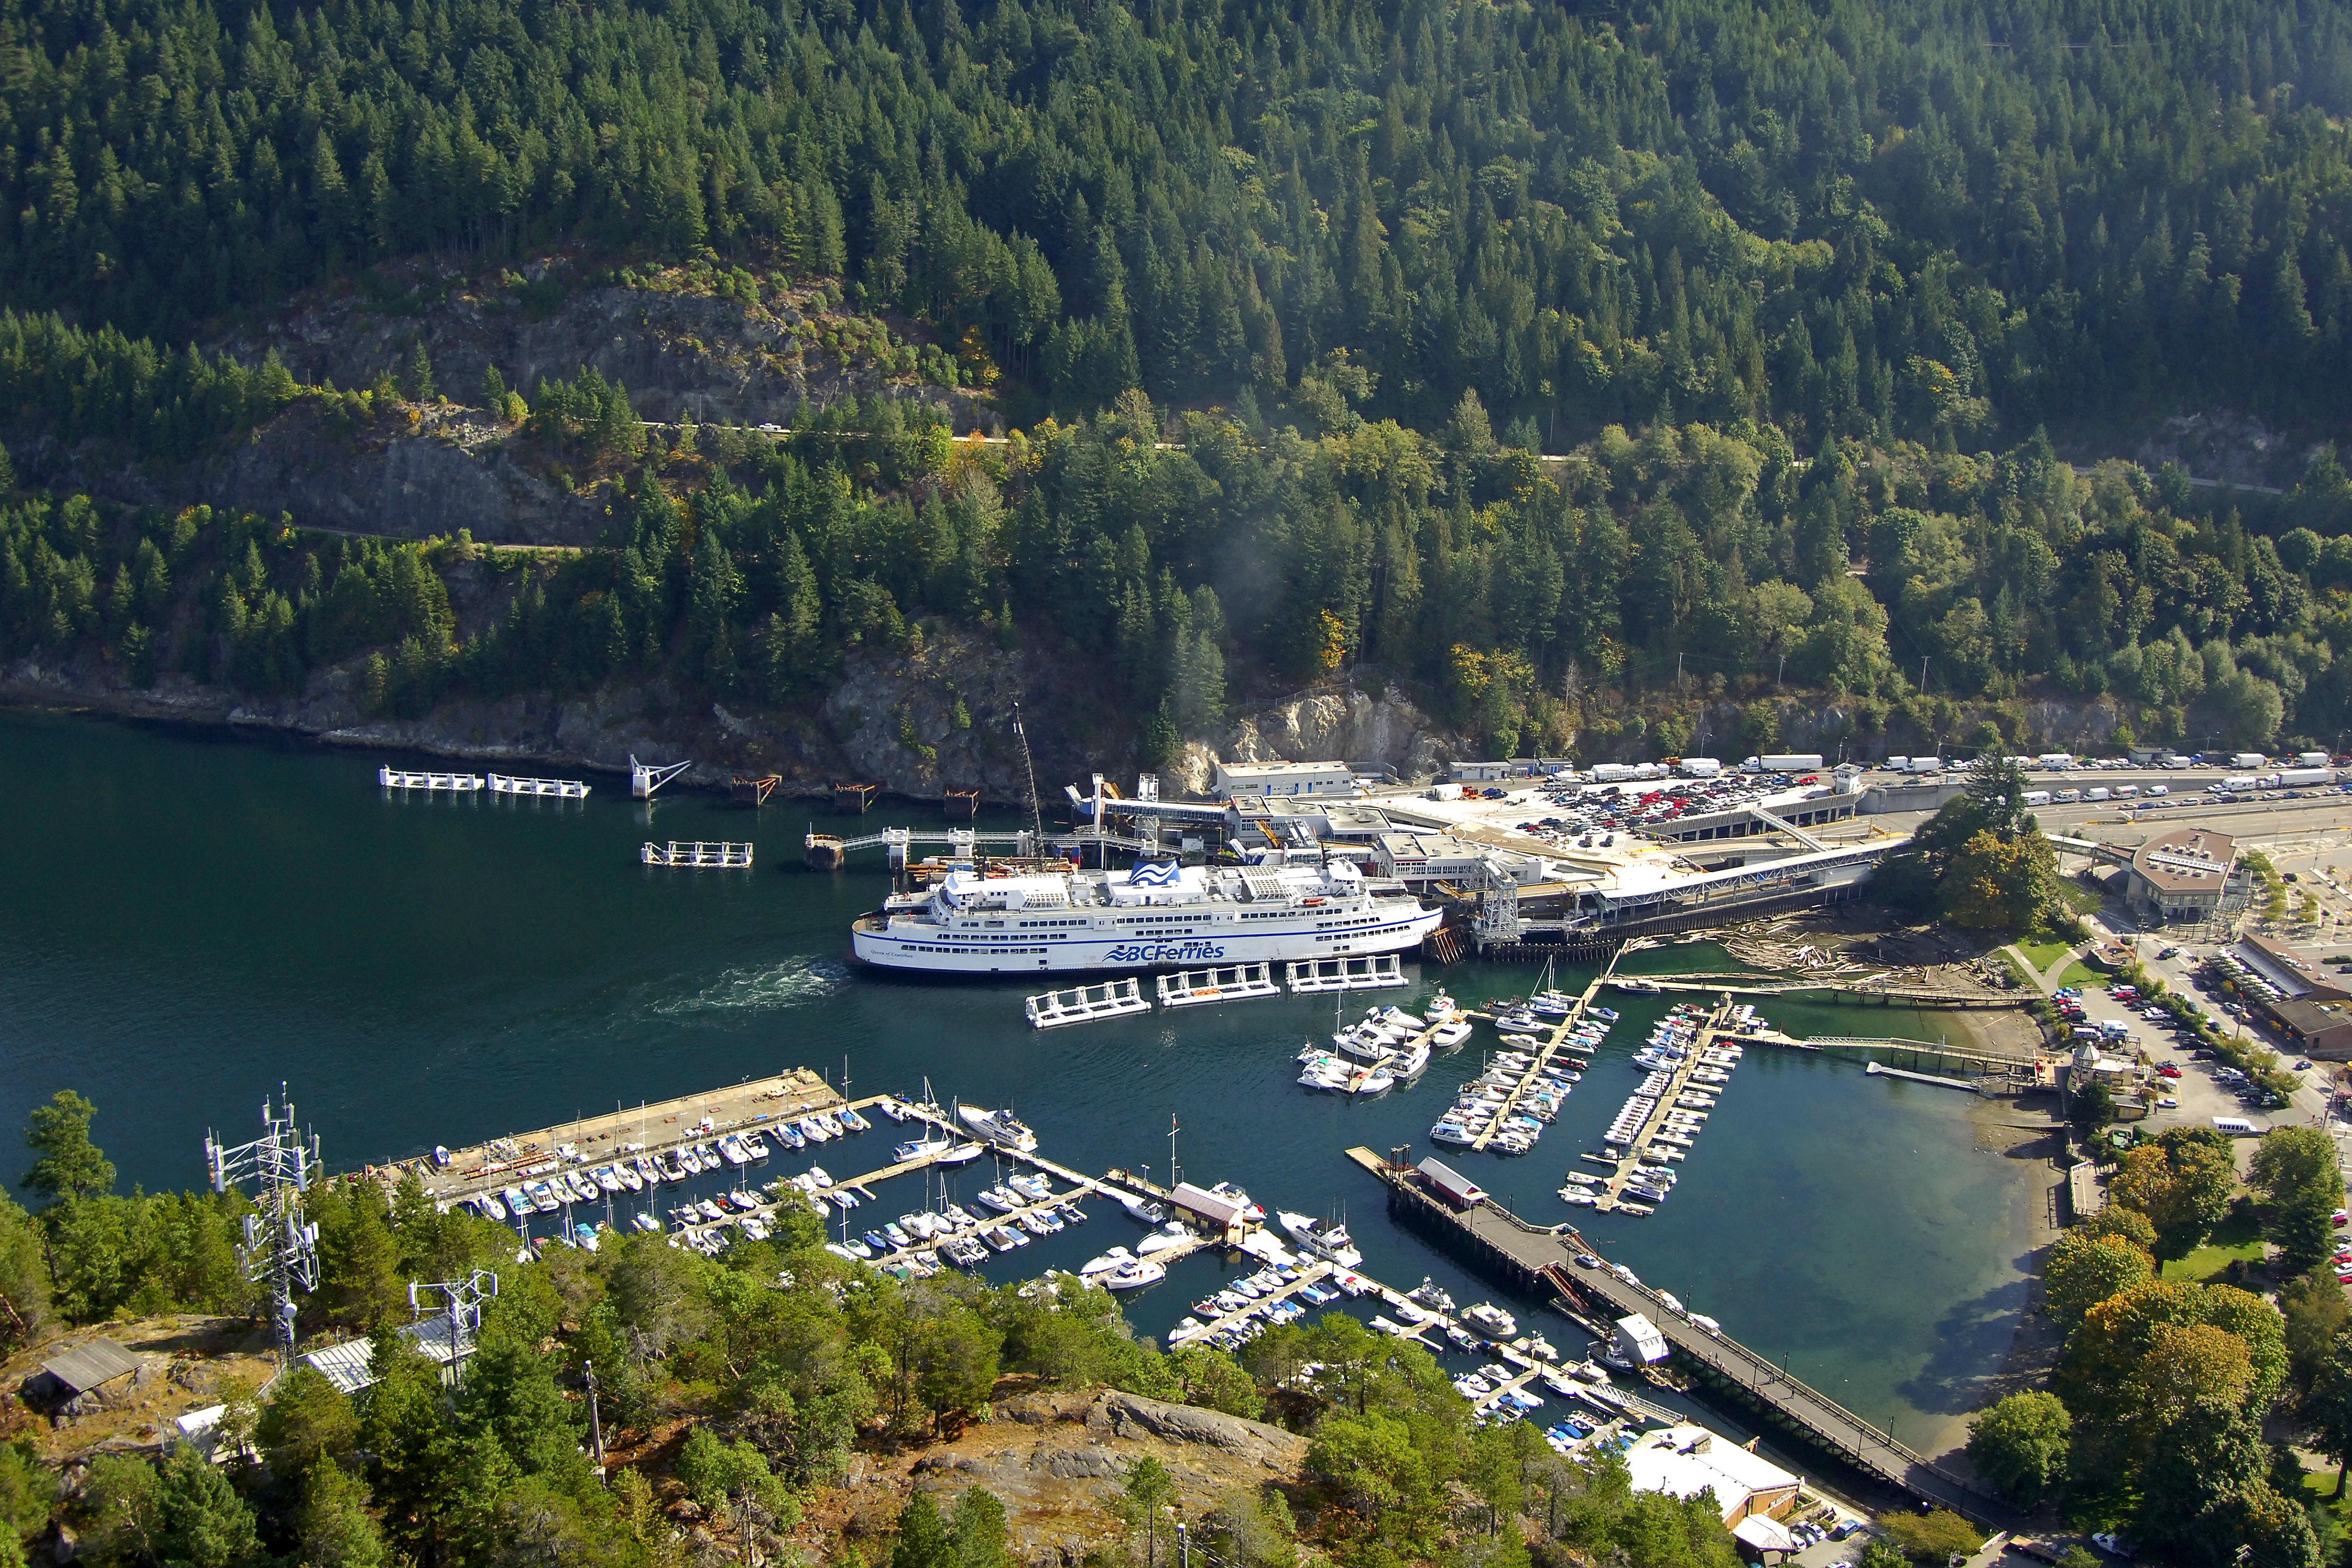 Lake LBJ Boat Rentals | Horseshoe Bay Boats | Sunrise ...  |Horseshoe Bay Boat